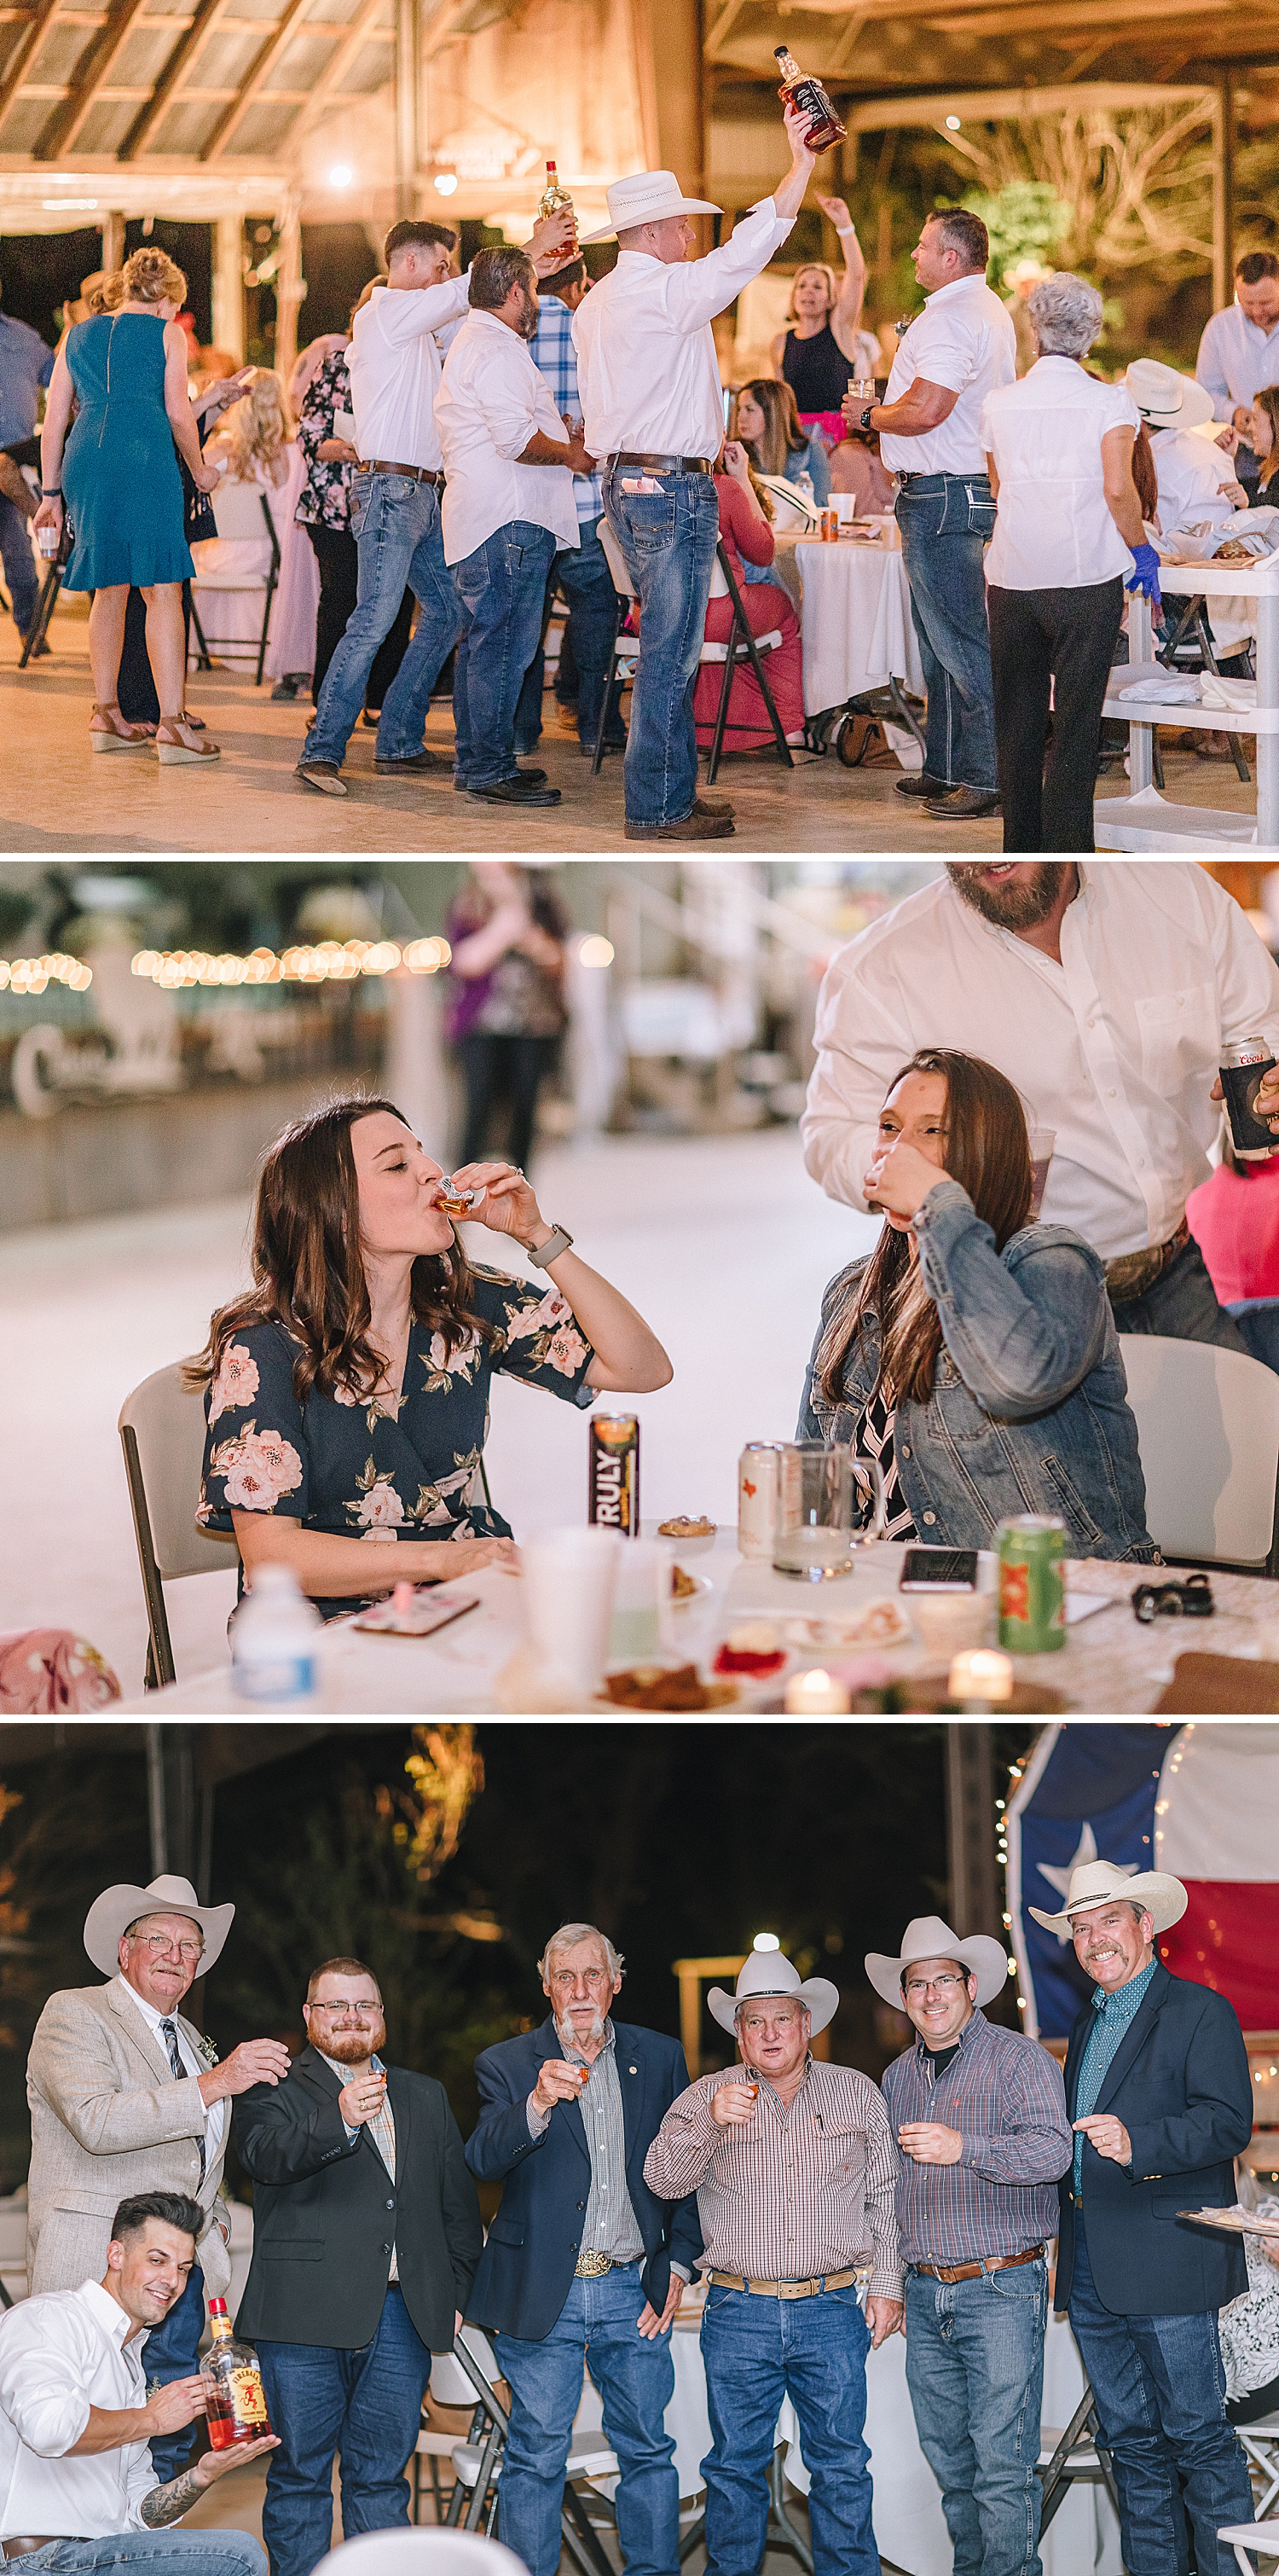 Rio-Cibilo-Ranch-Marion-Texas-Wedding-Rustic-Blush-Rose-Quartz-Details-Carly-Barton-Photography_0103.jpg